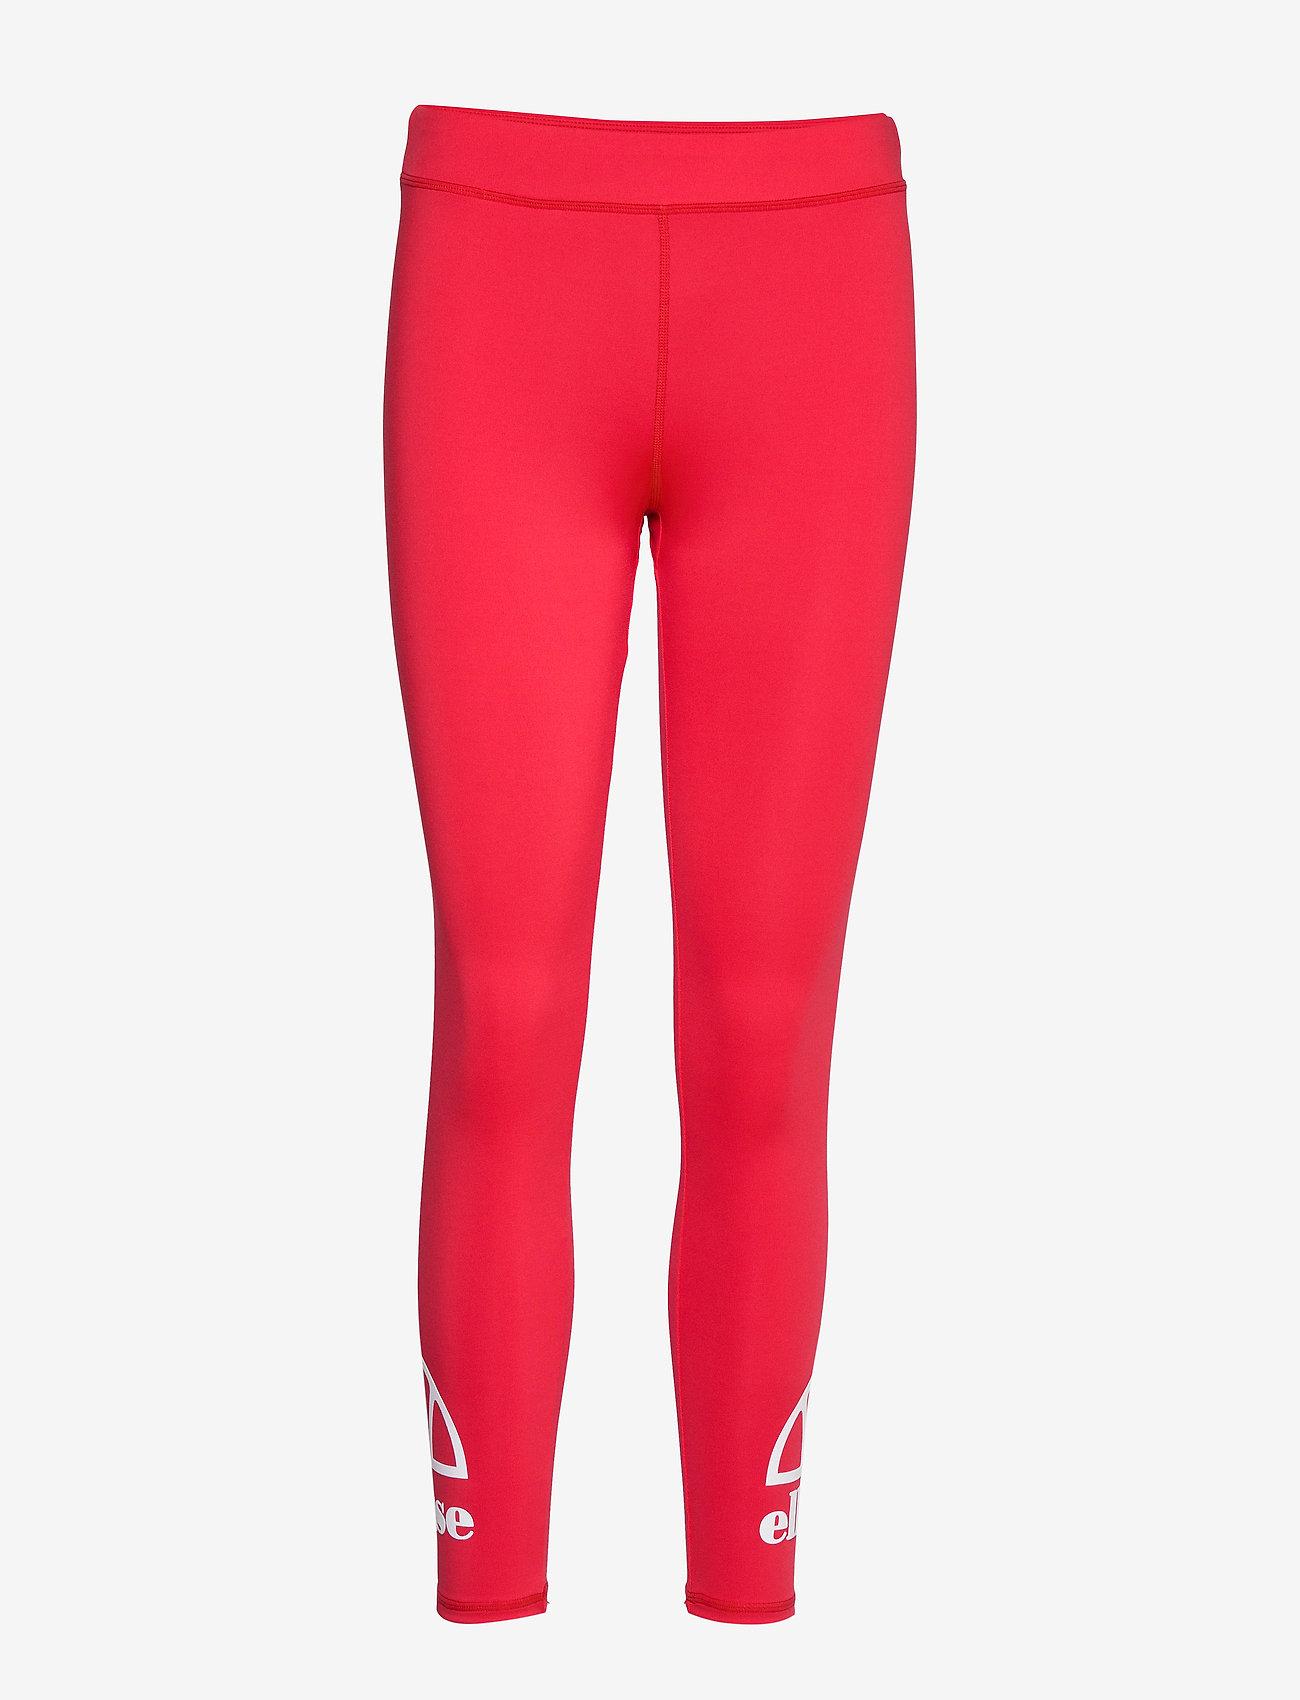 Ellesse - EL BONIFACIO - leggings - pink - 0